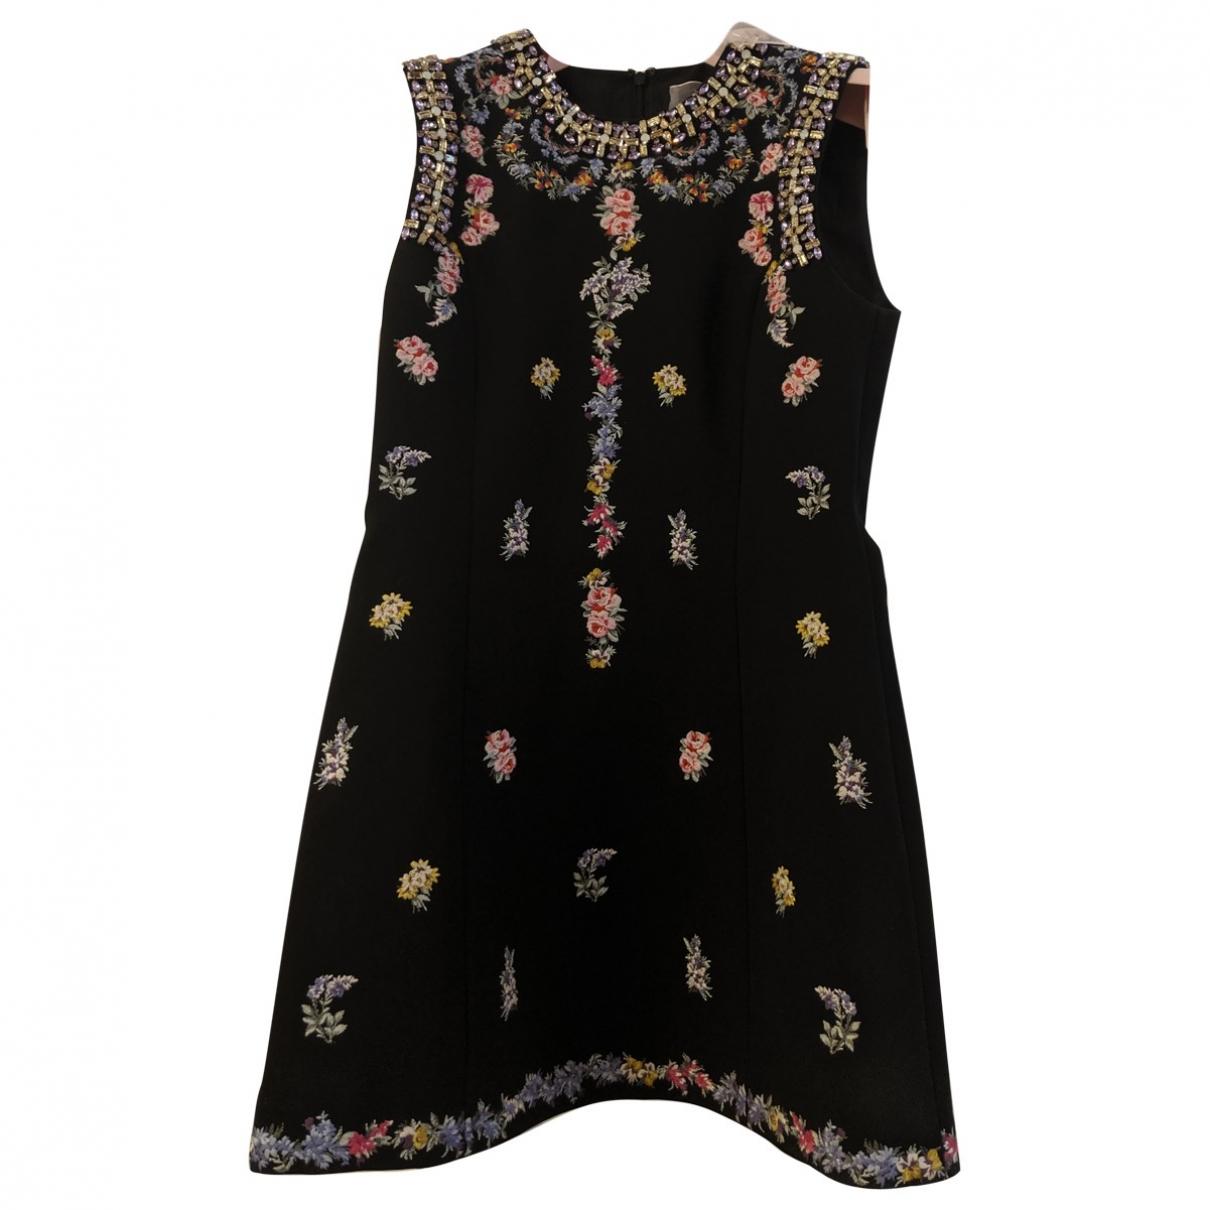 Giambattista Valli X H&m \N Black dress for Women 36 FR